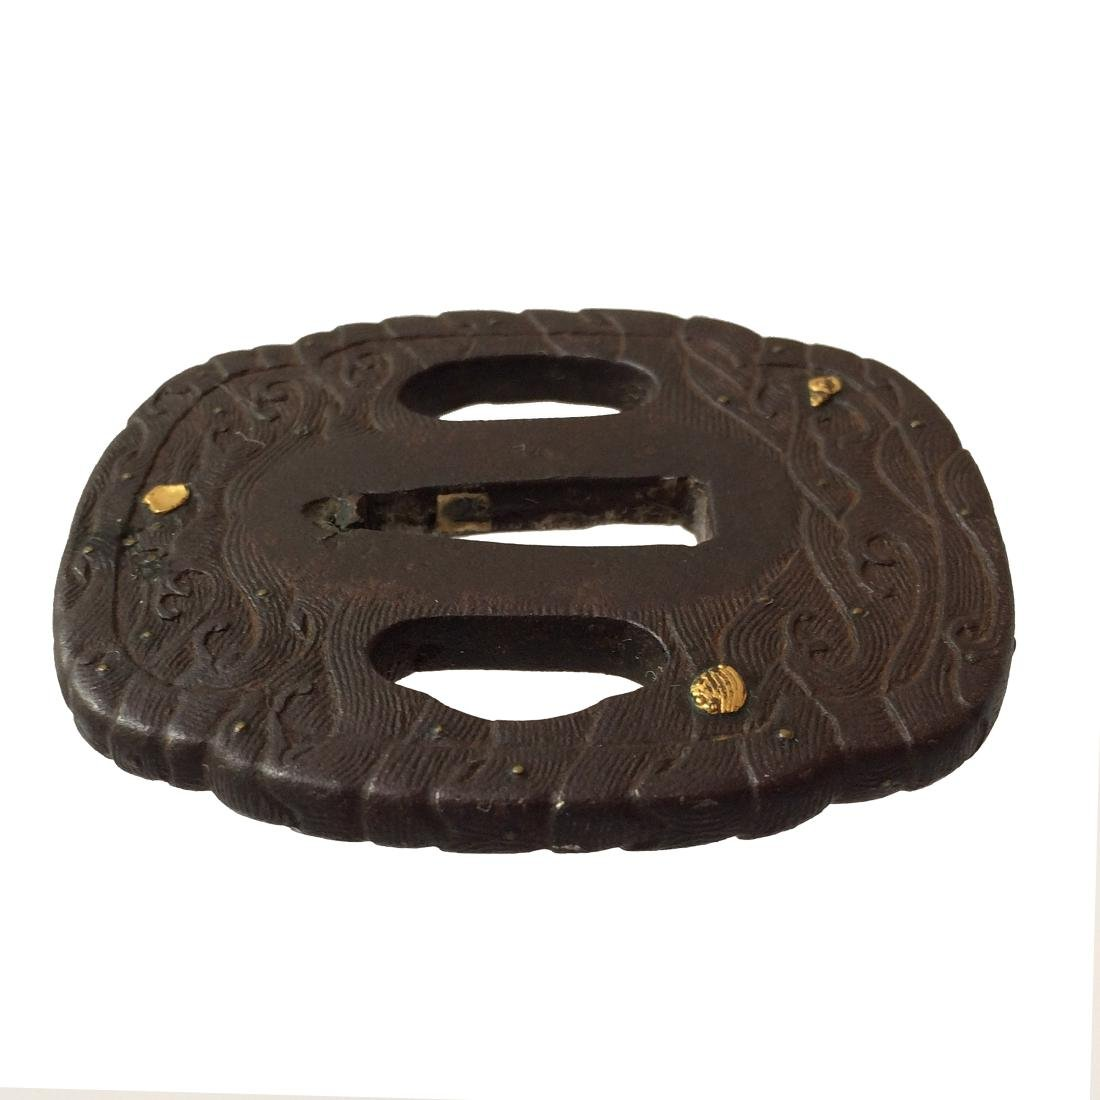 Iron tsuba with gold inlay - 3